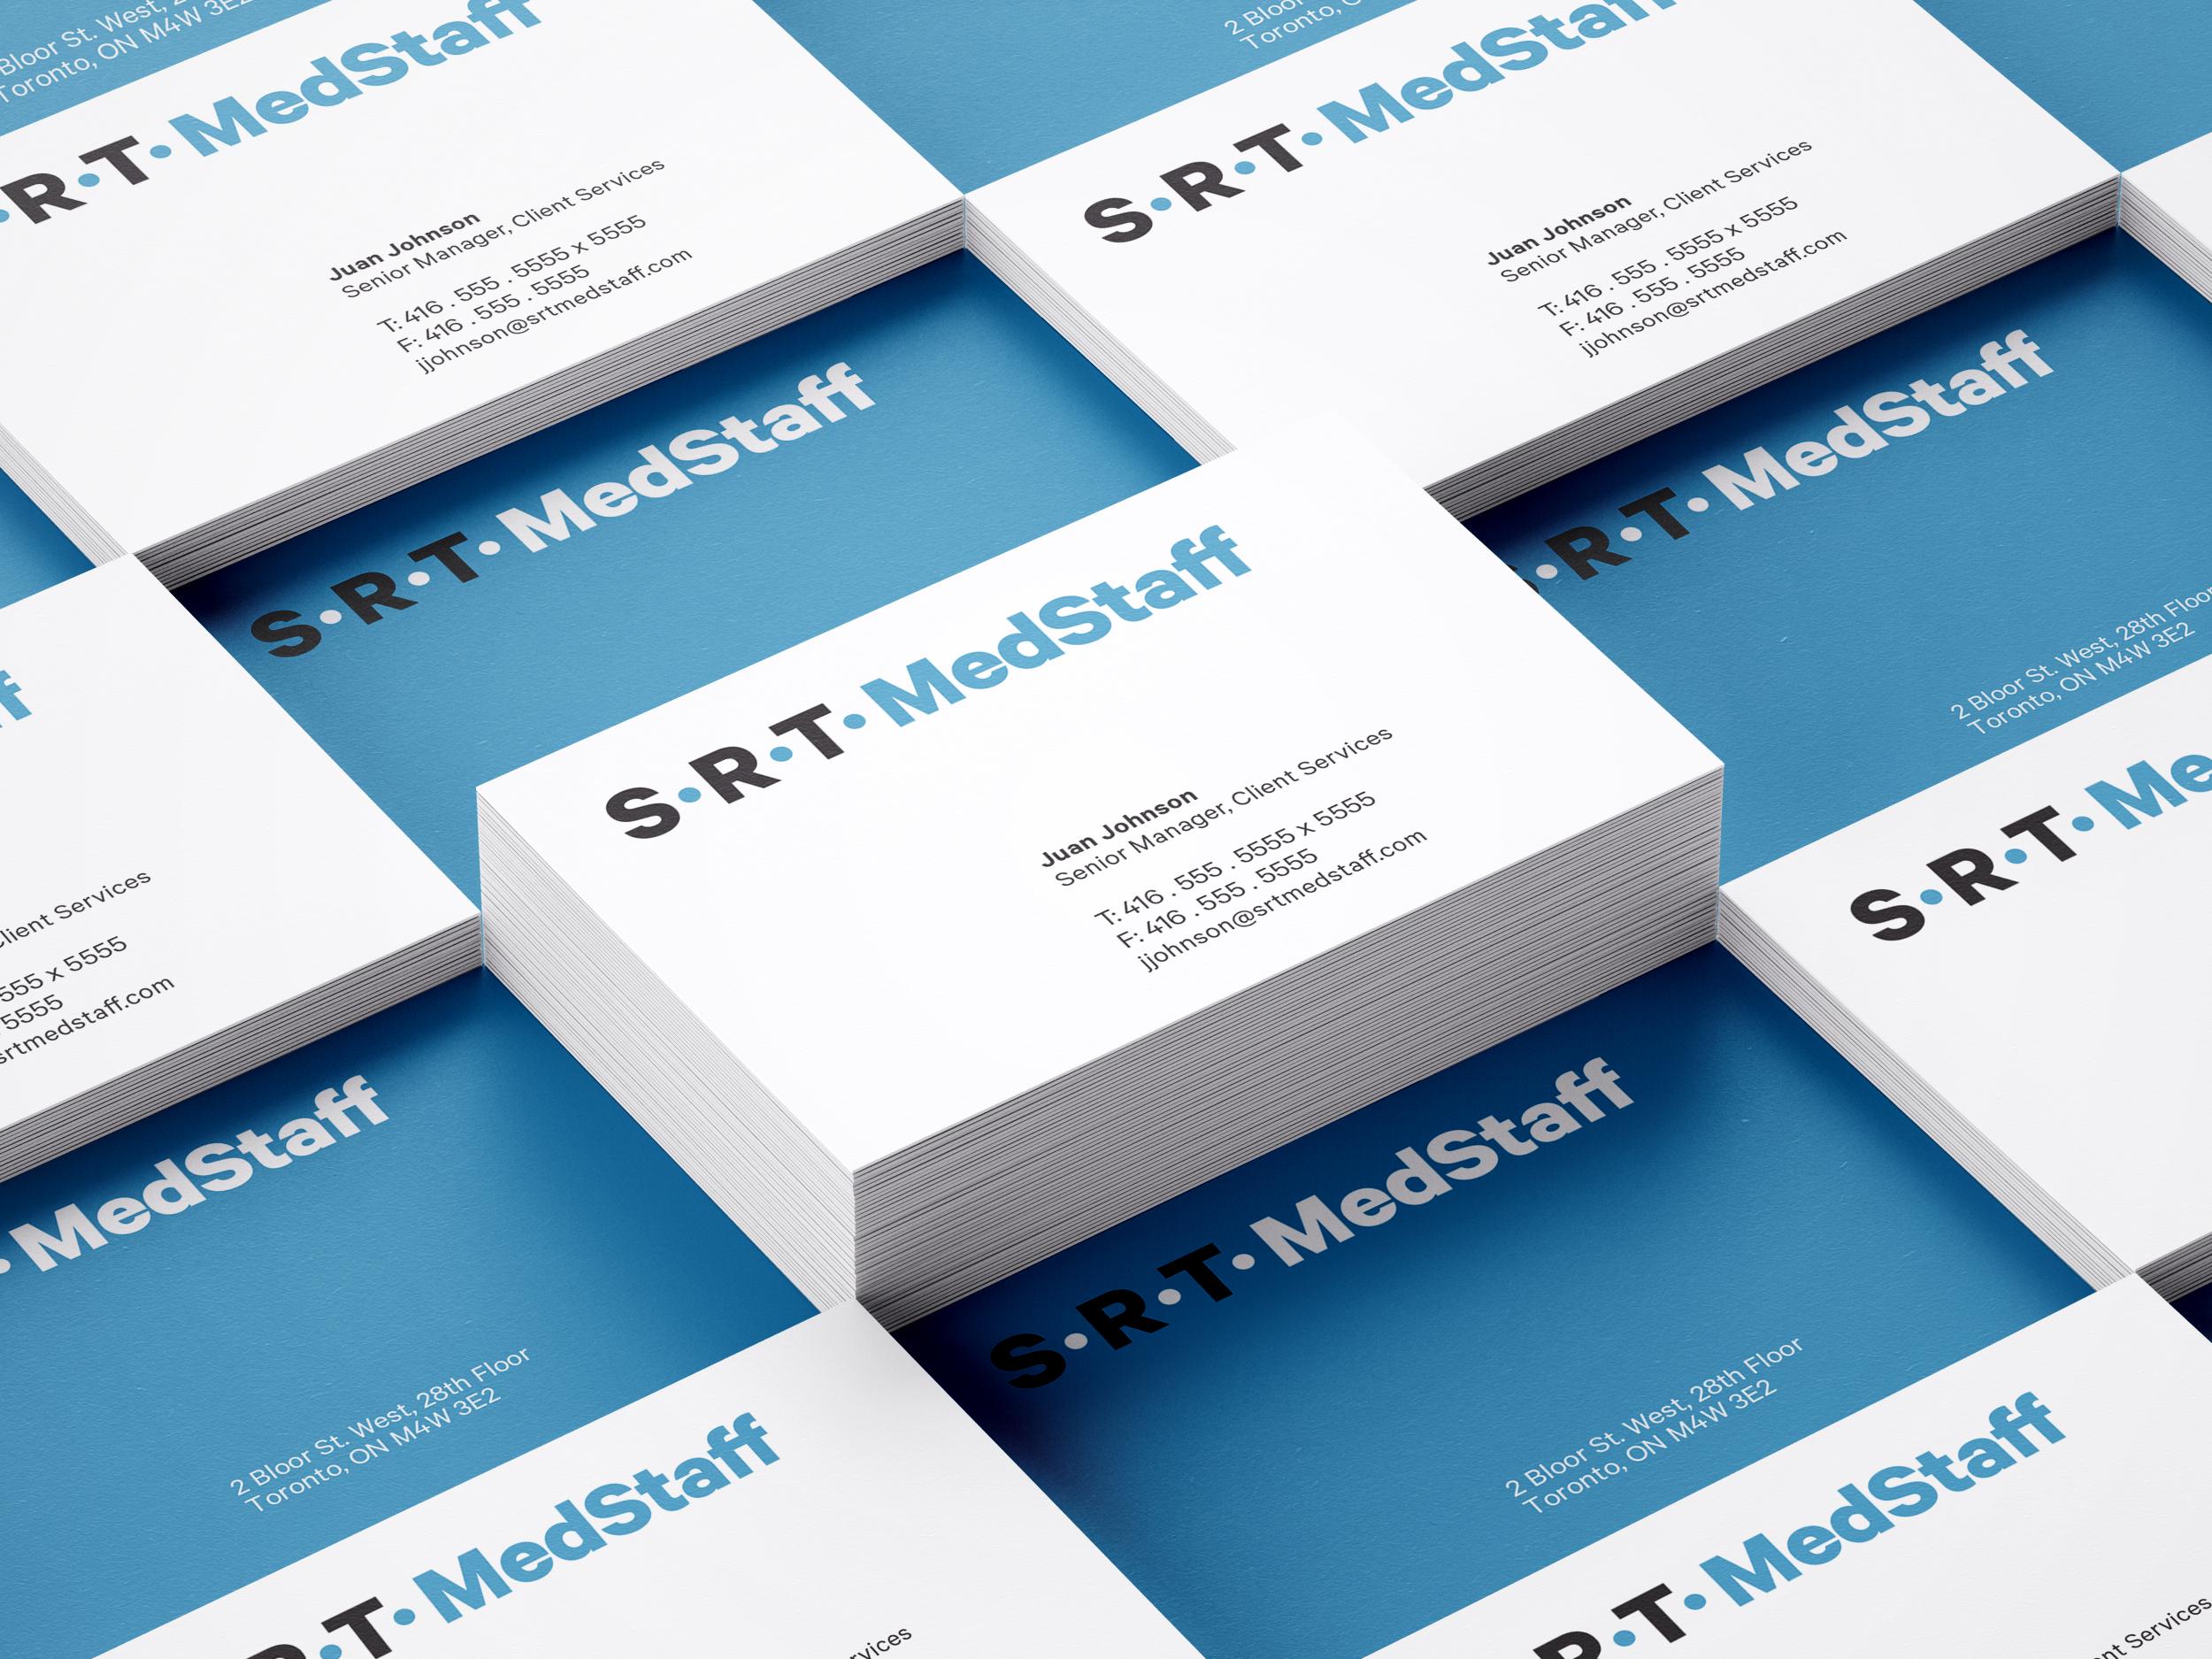 SRT_BusinessCards.jpg